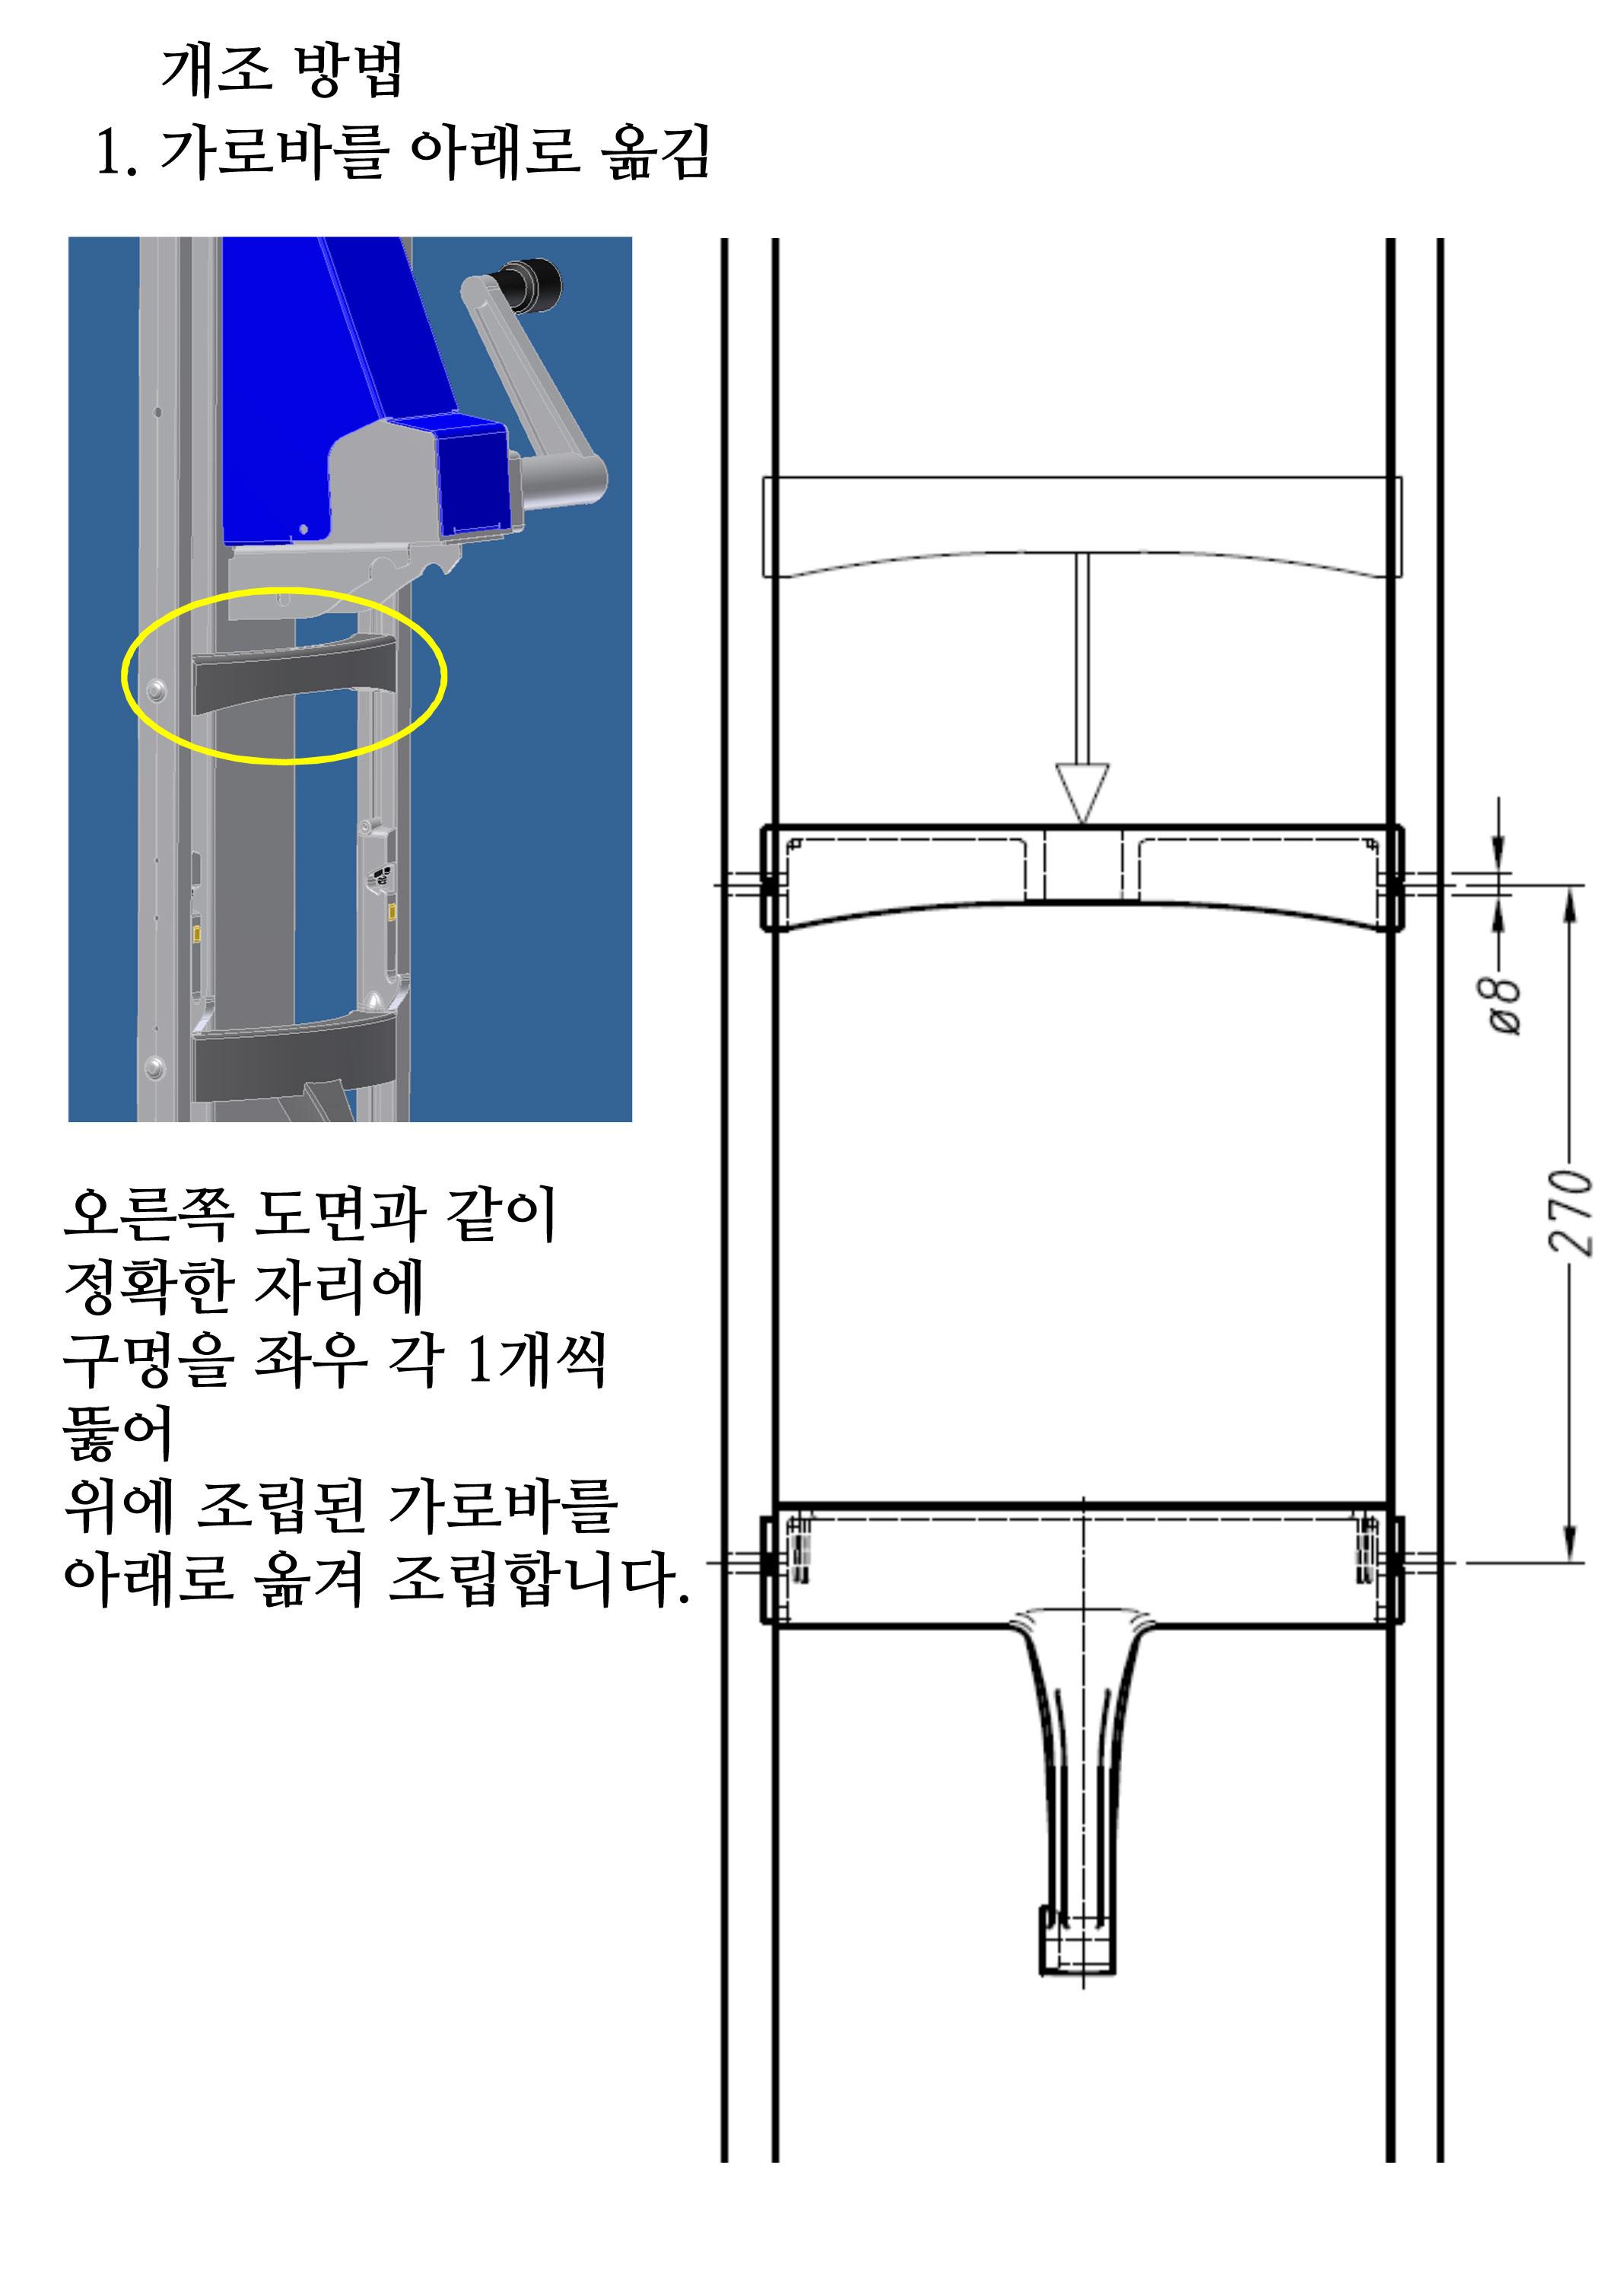 SANO SAL Lifting System 리프팅시스템 장착을 위한 개조 방법